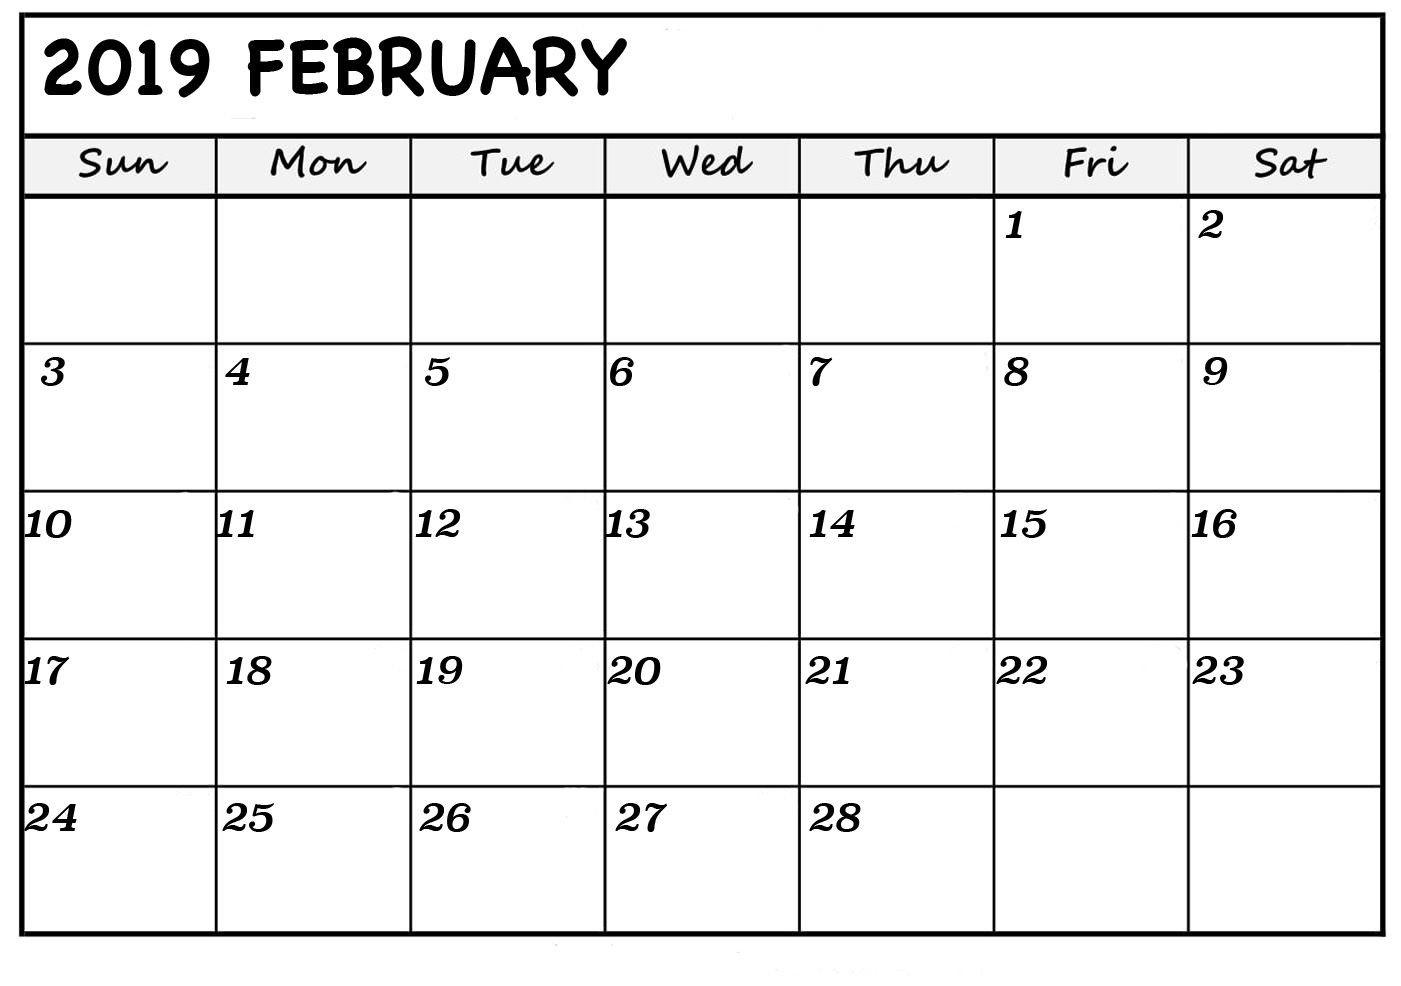 Download February 2019 Printable Calendar Pdf Excel Word-Preschool Word Excel Calendar Template